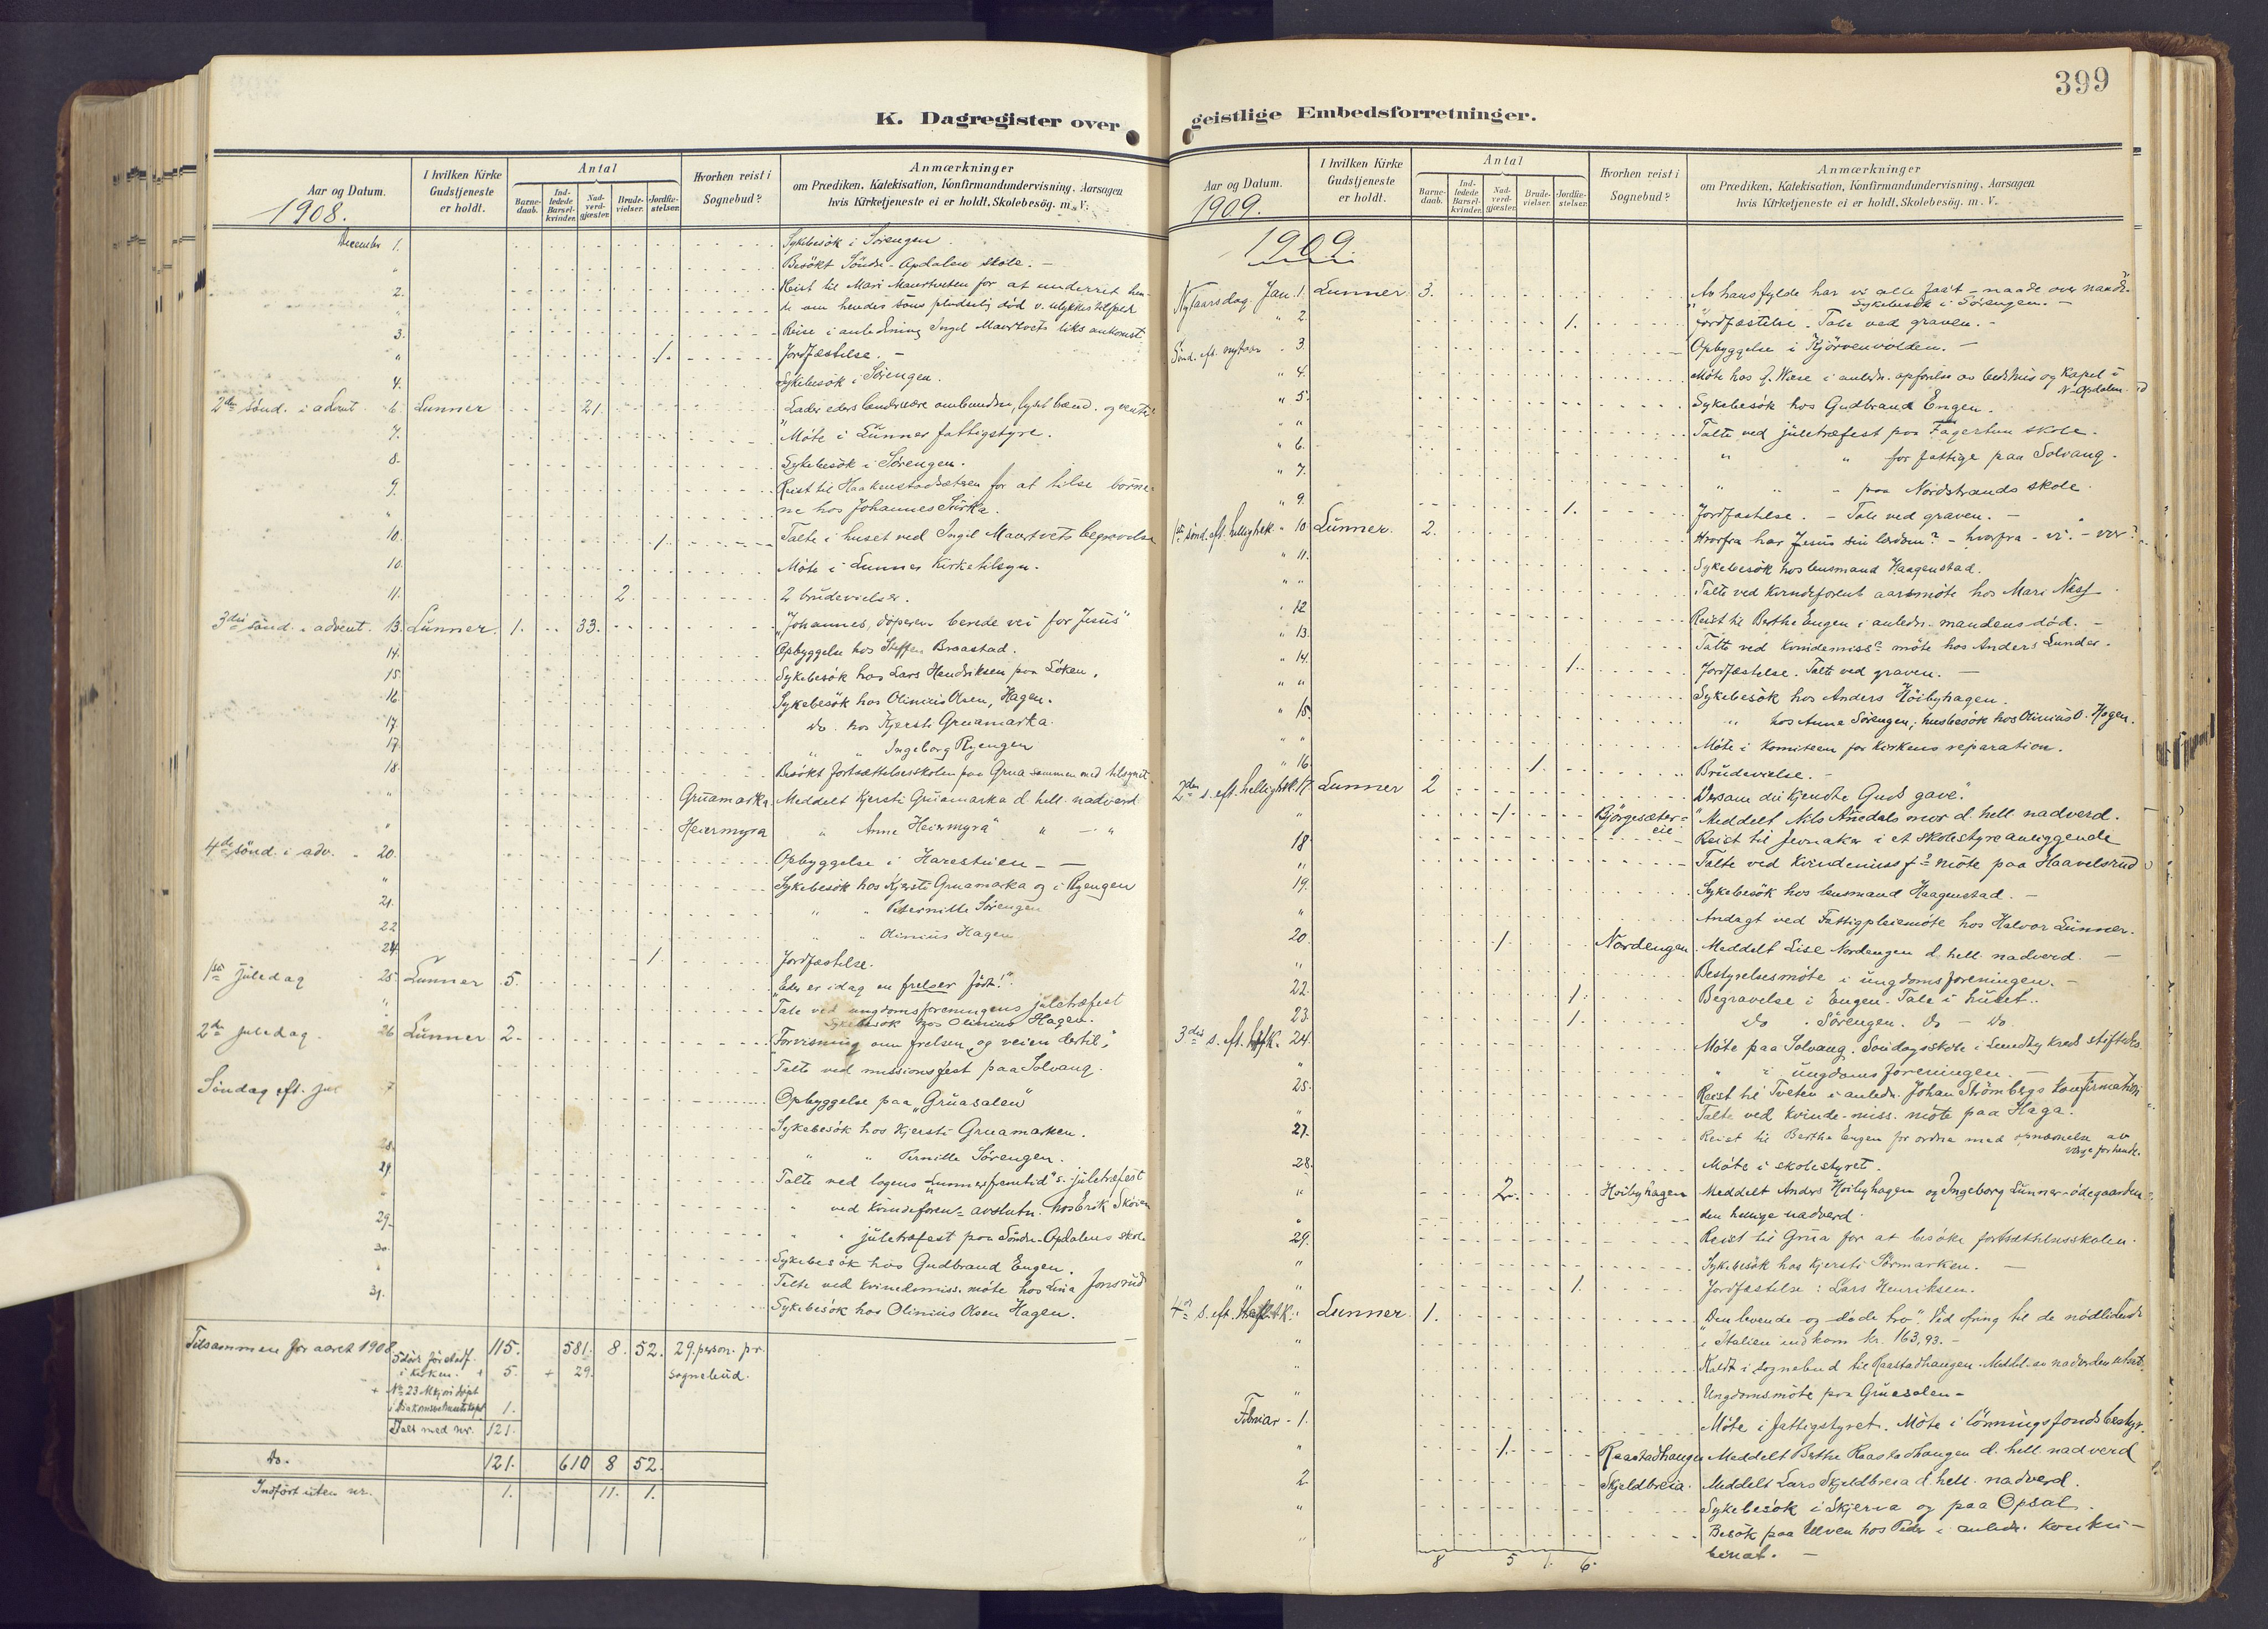 SAH, Lunner prestekontor, H/Ha/Haa/L0001: Ministerialbok nr. 1, 1907-1922, s. 399